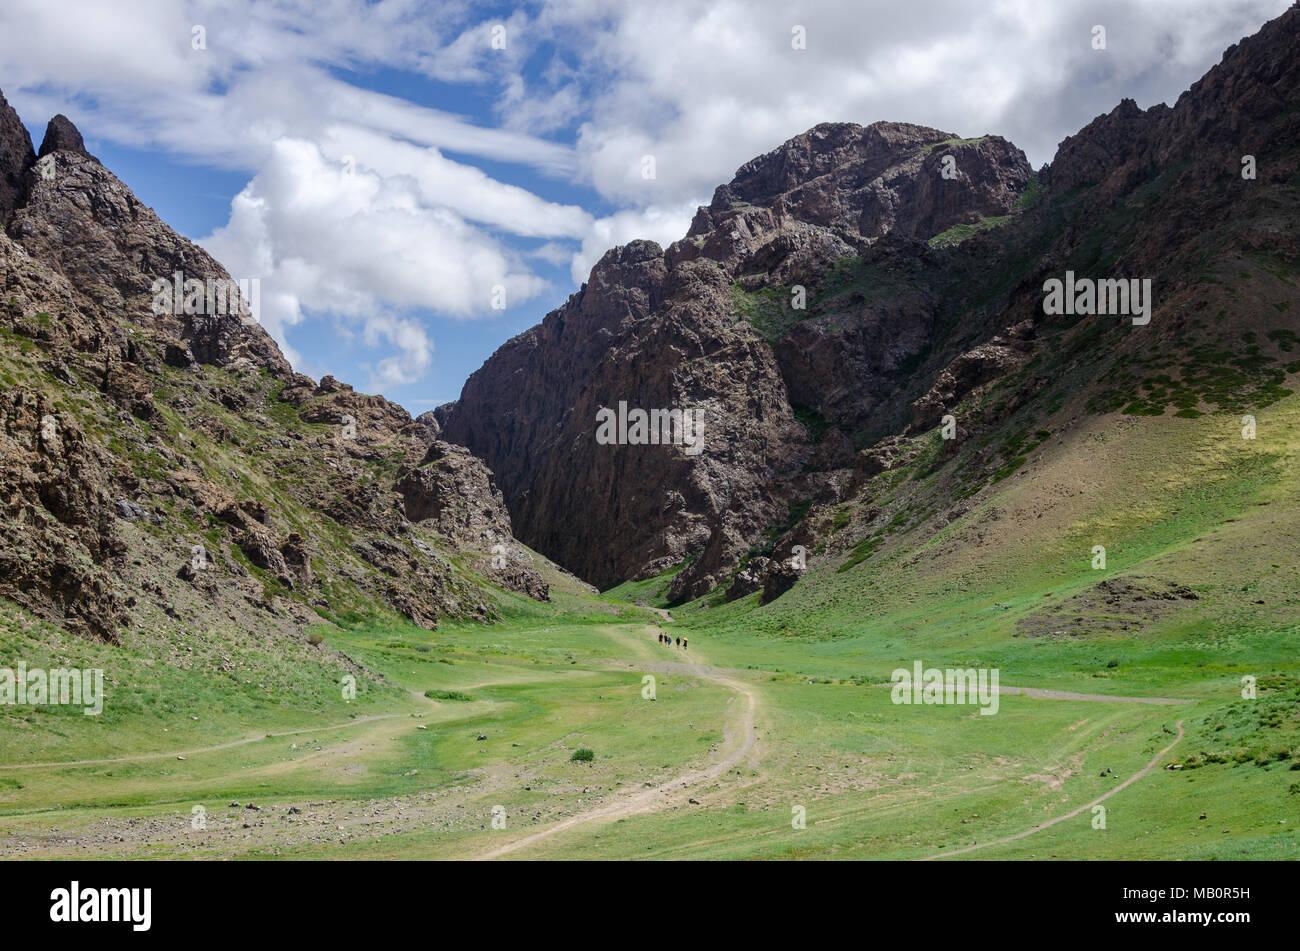 Yolym Valley, Gobi Desert, Mongolia - Stock Image